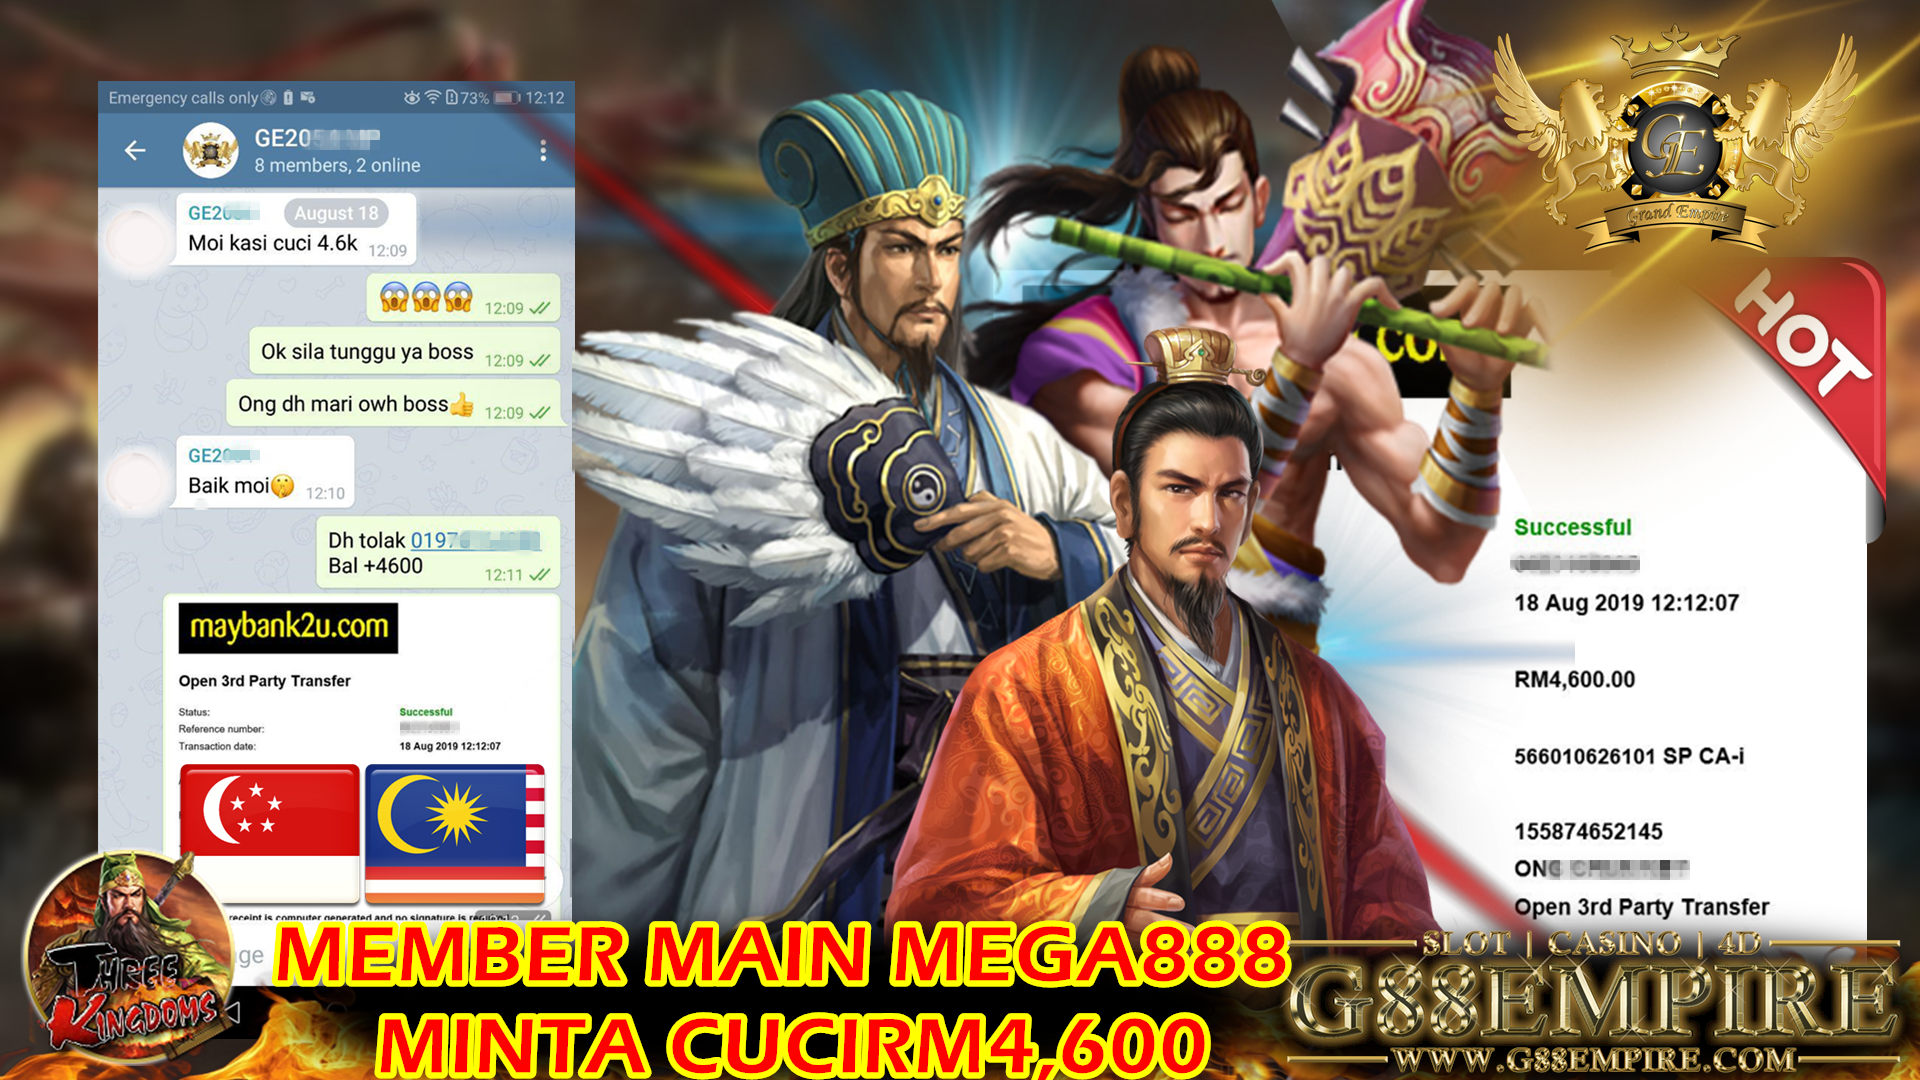 Mega888 ft.Three Kingdom Cuci RM4600 !!